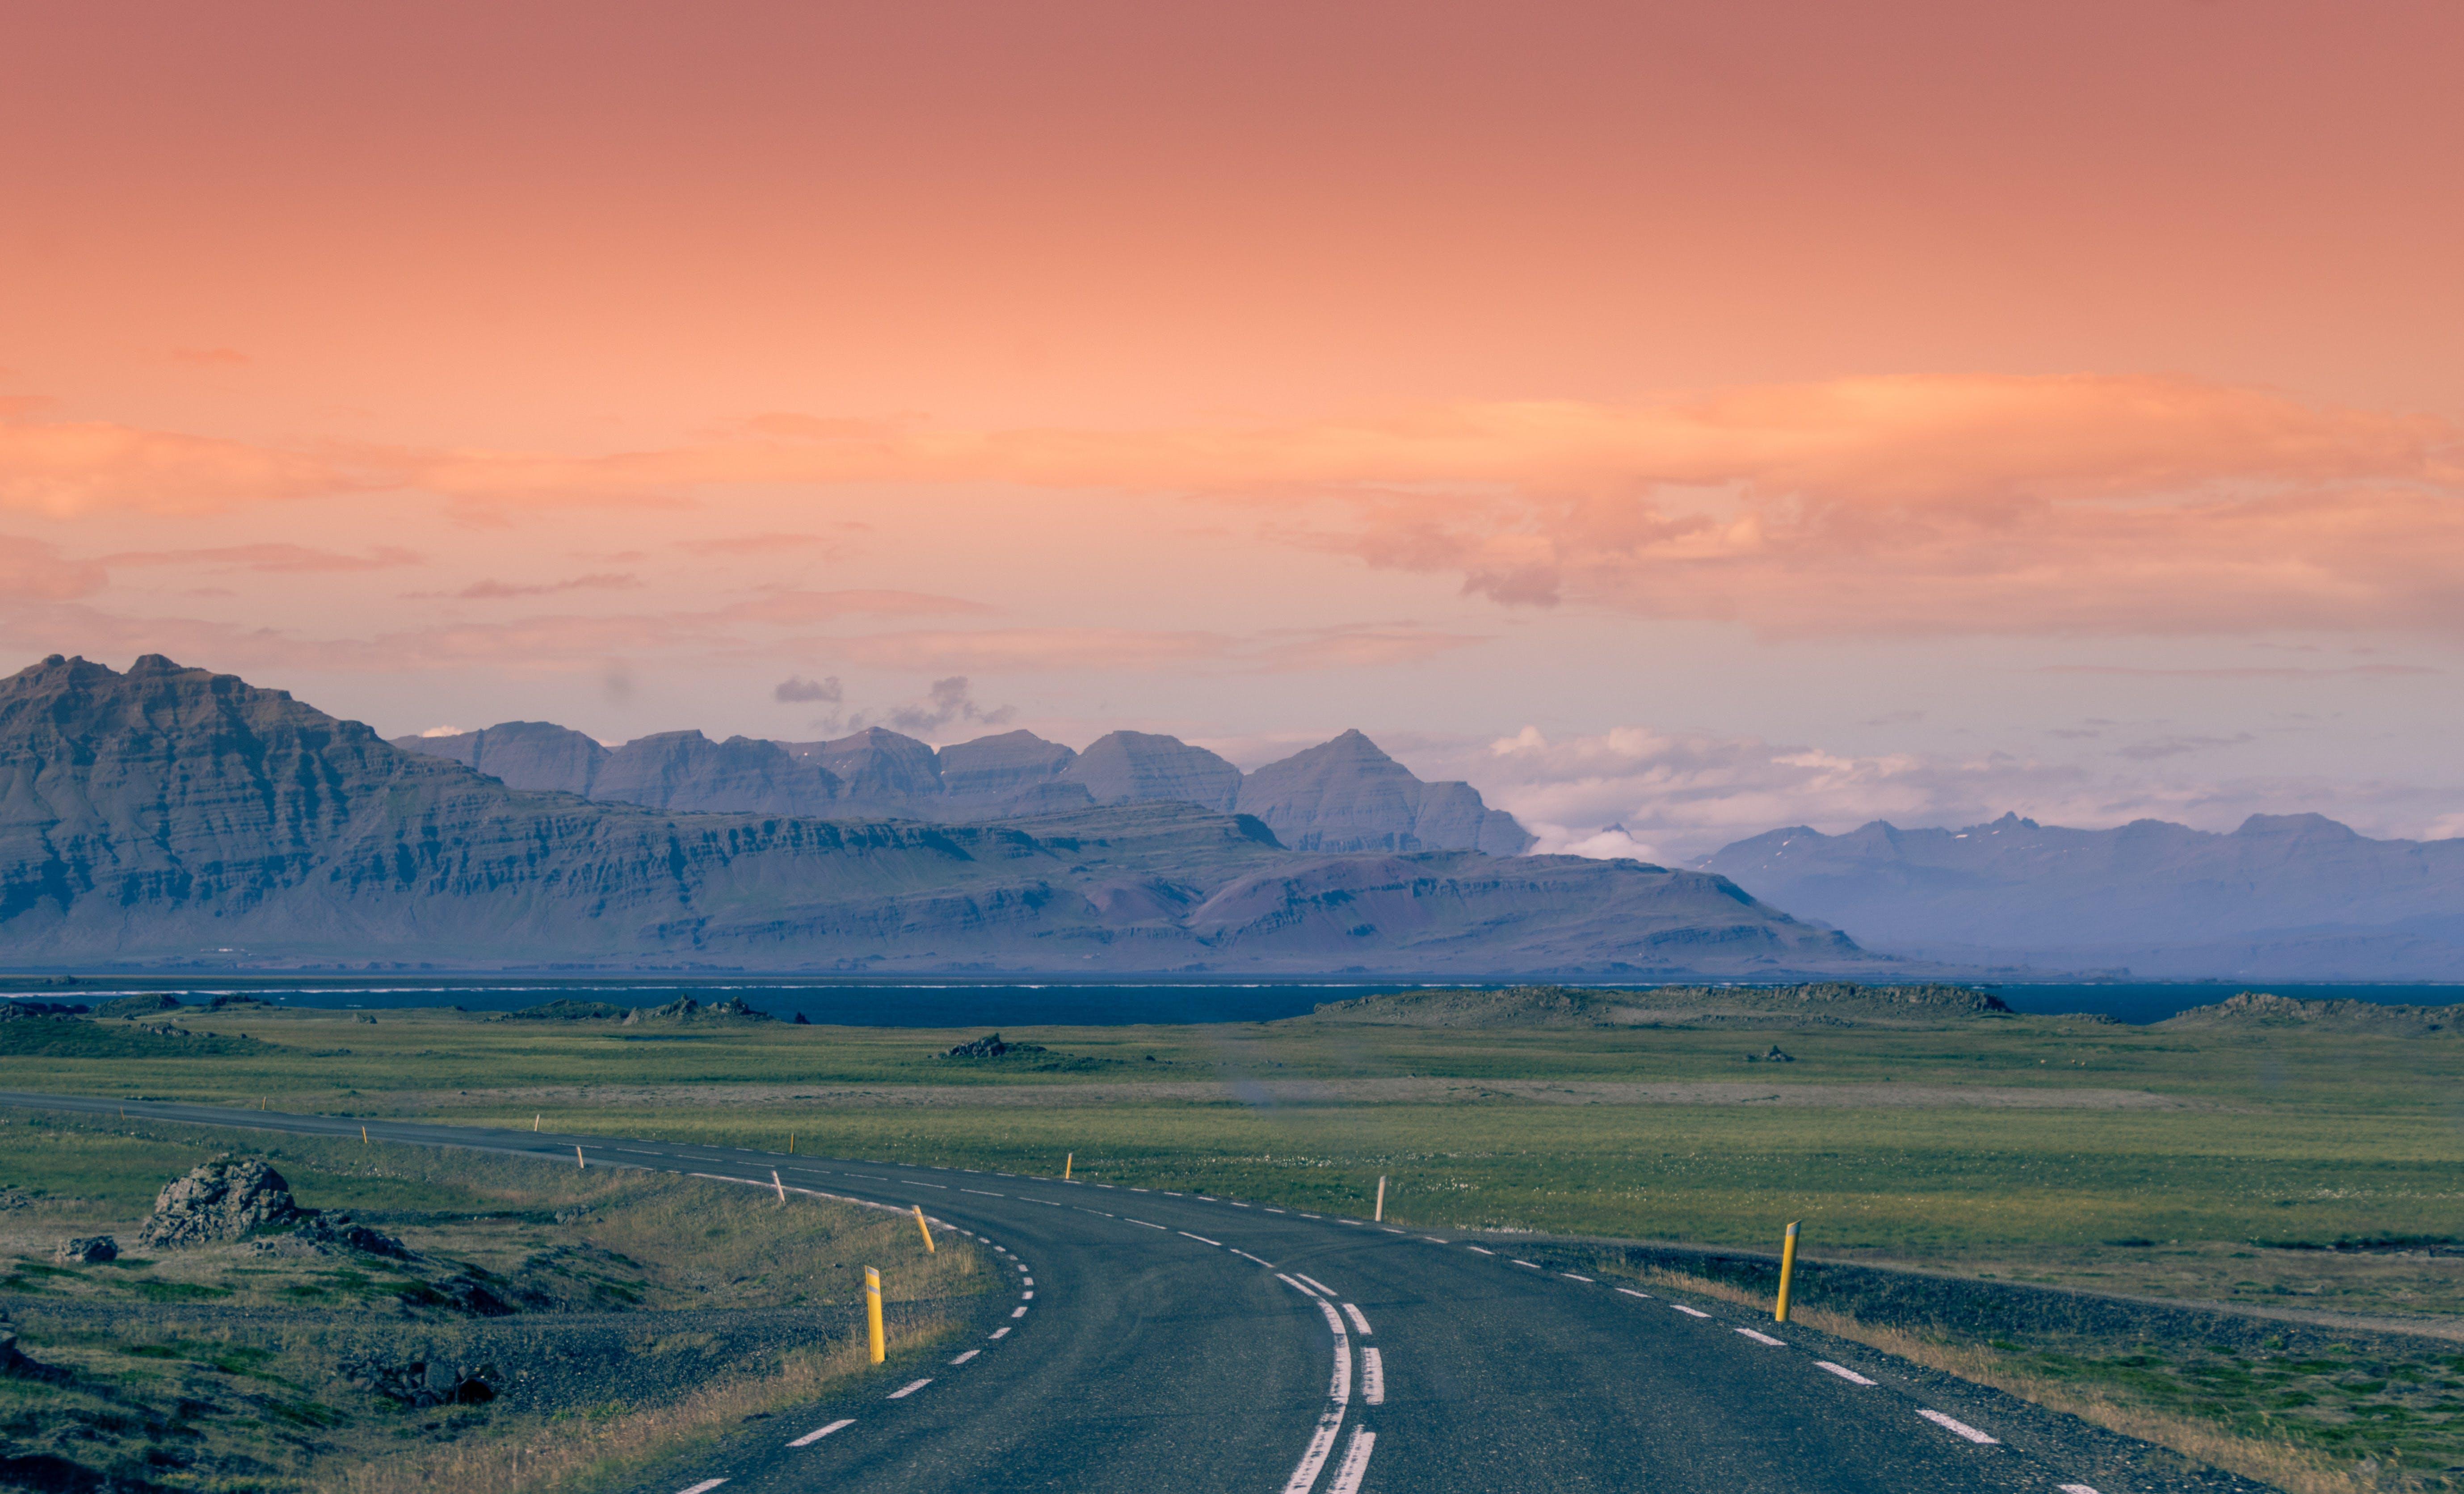 Kostenloses Stock Foto zu asphalt, berge, entfernung, goldene stunde